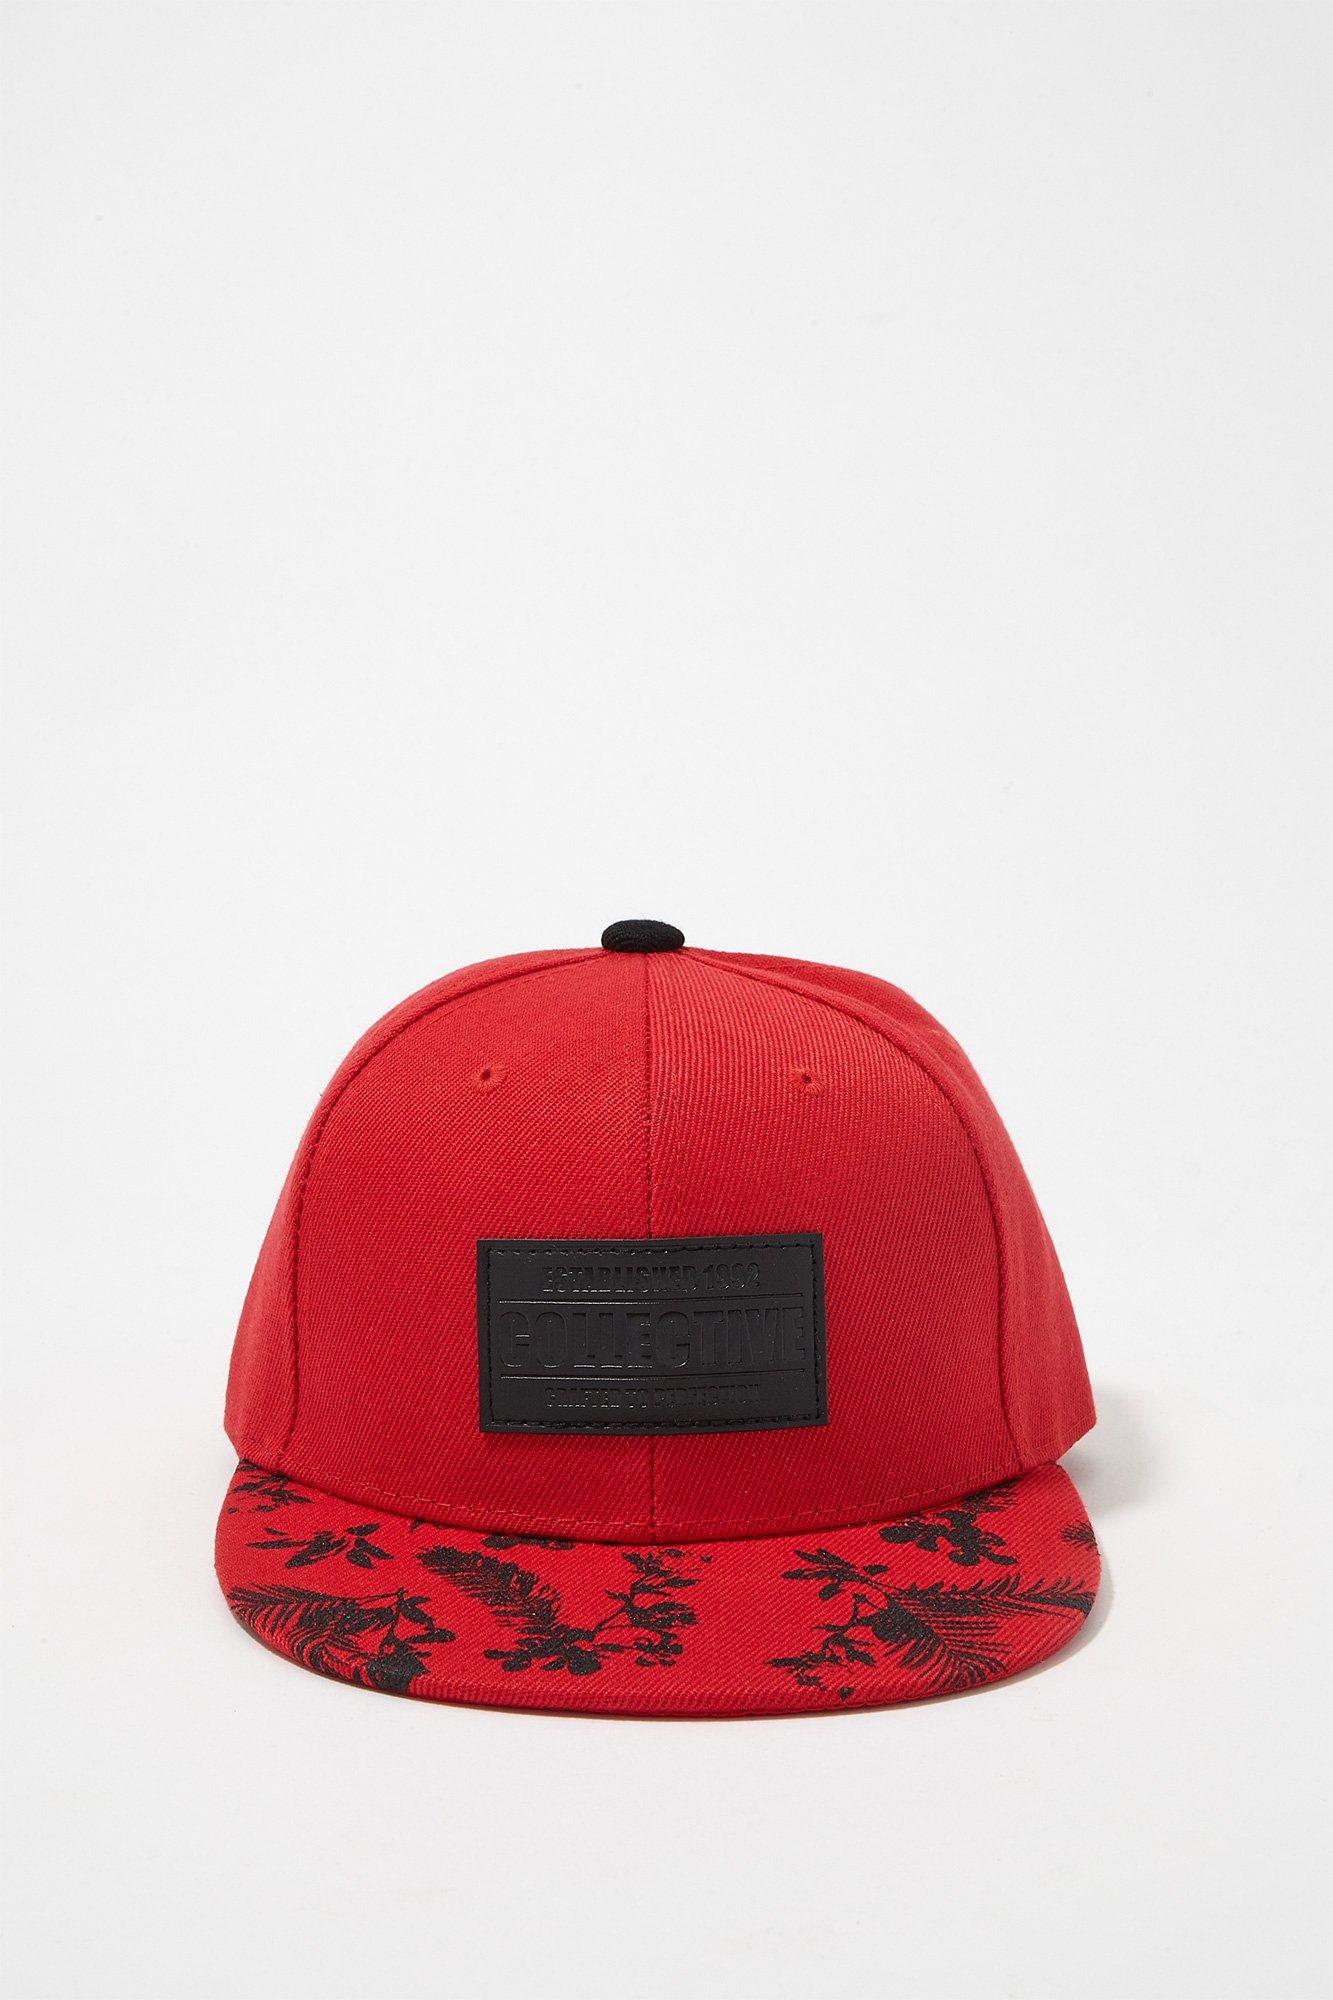 1b47aea61b5 Urban Kids Youth Boy s Boys Collective Tropical Printed Snapback Hat